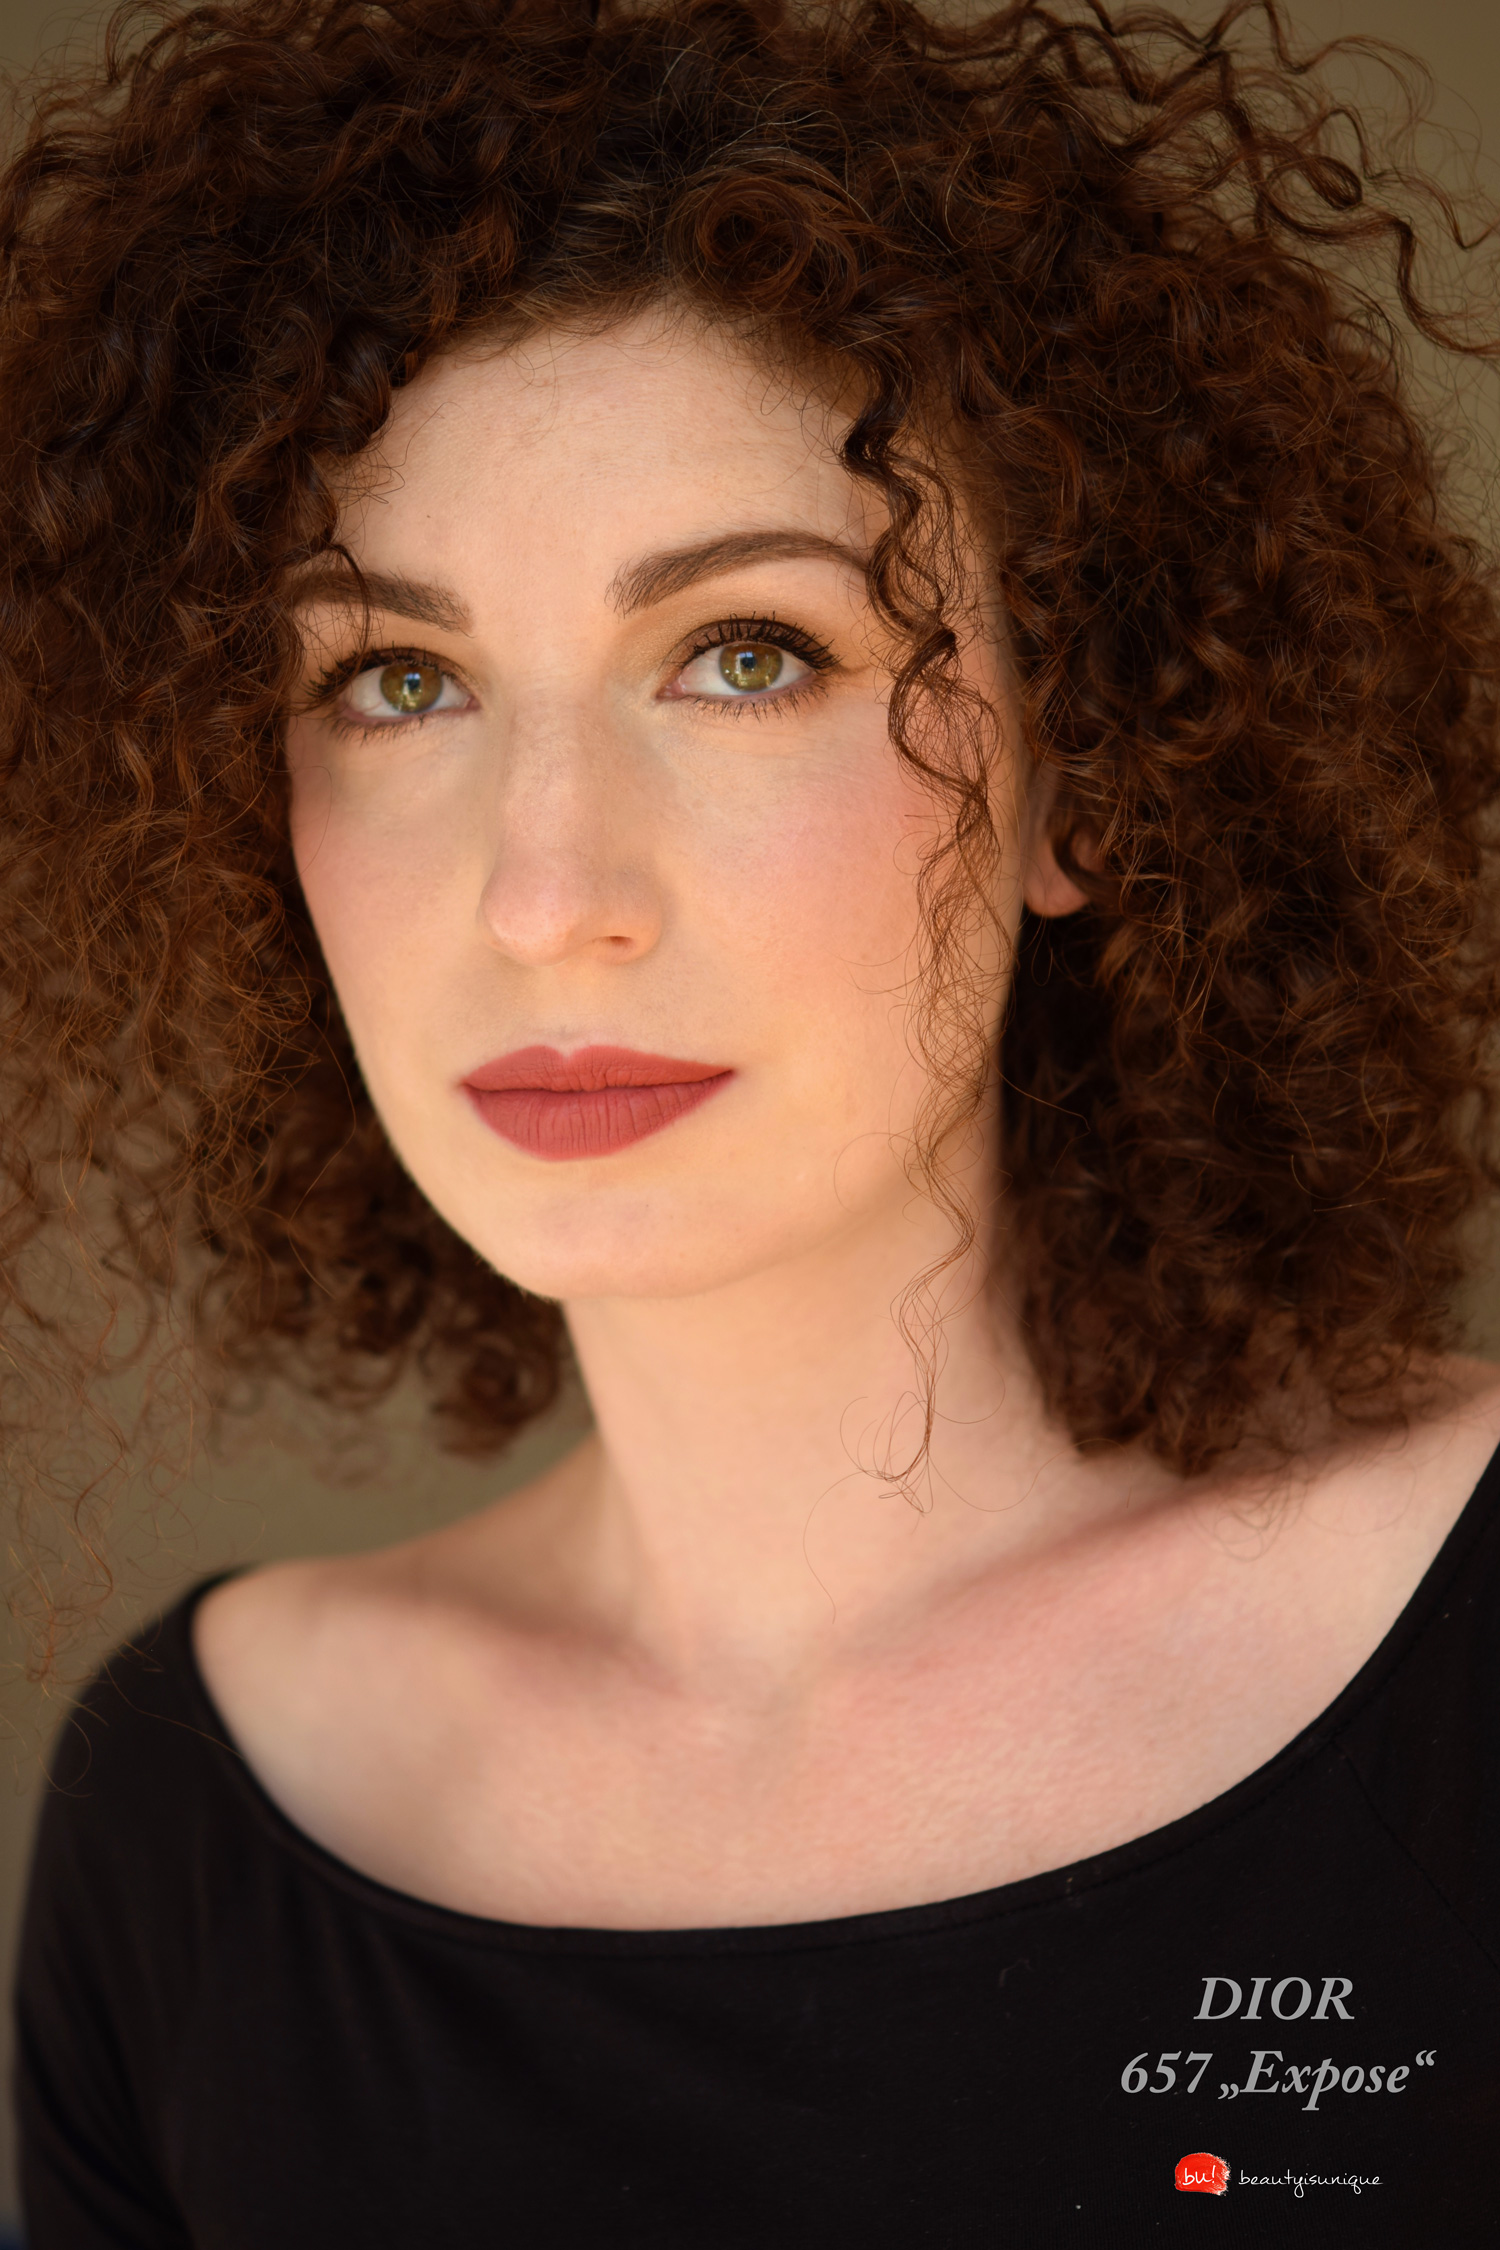 Dior-expose-eyshadow-makeup-657